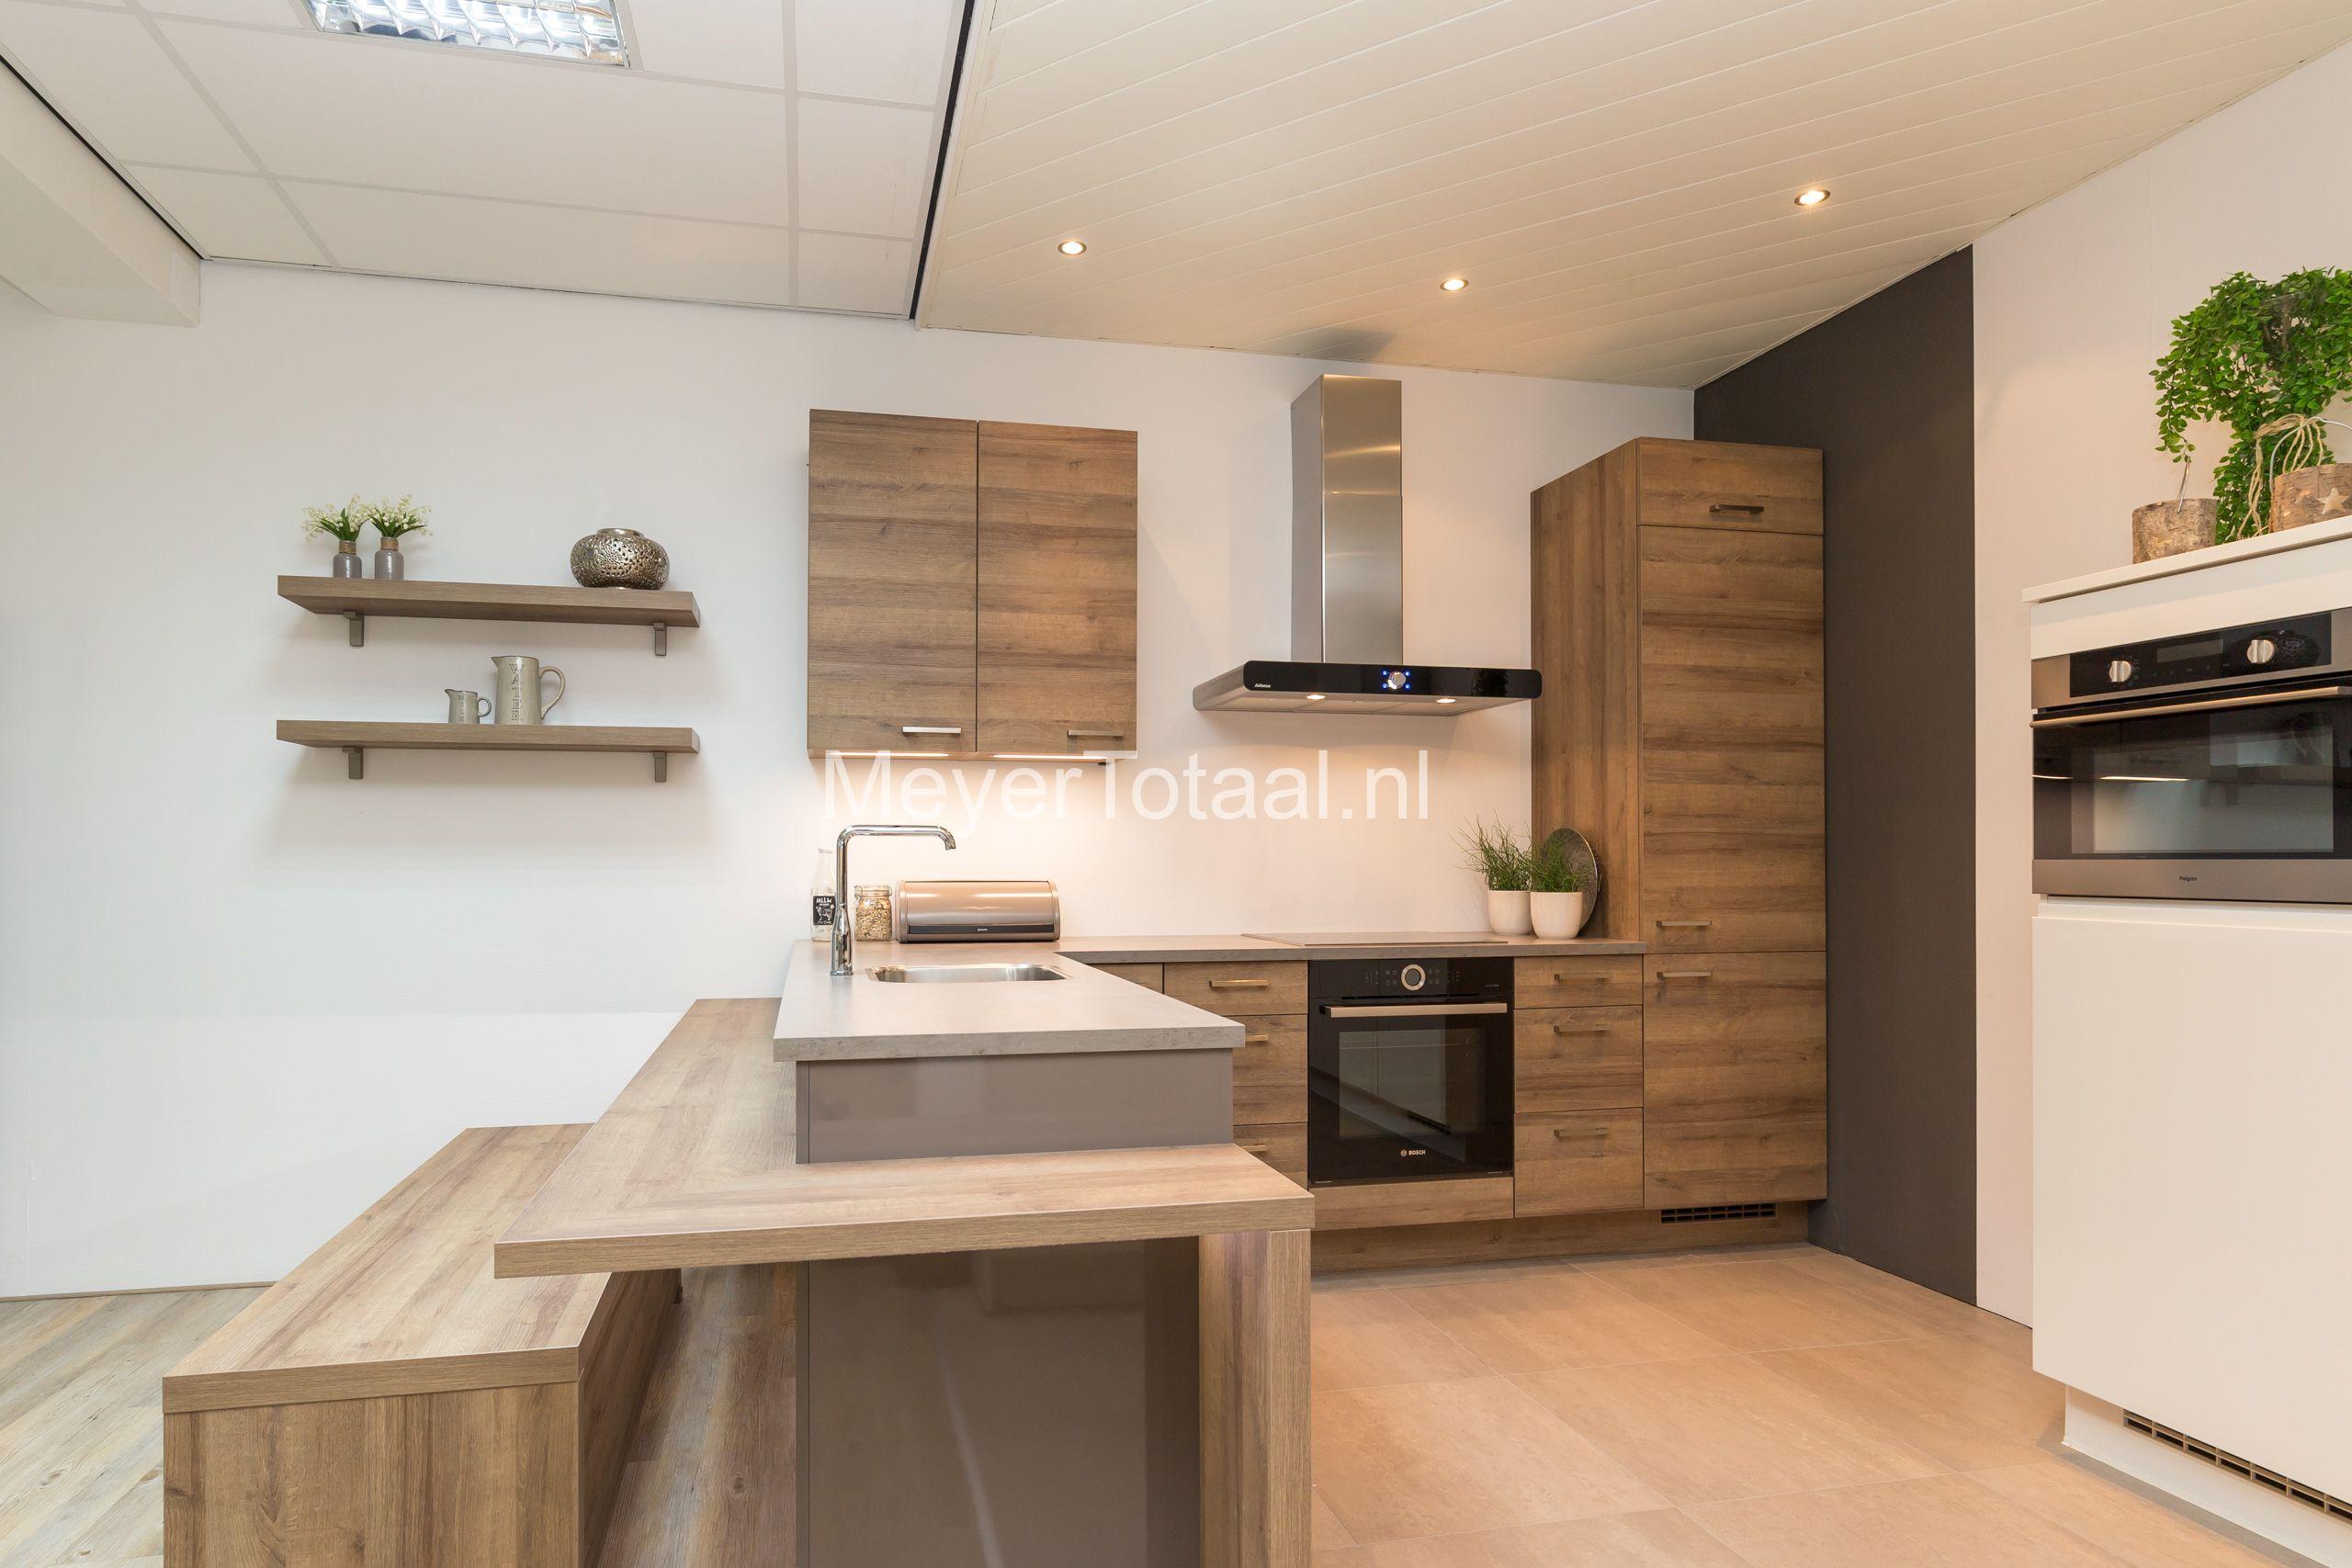 Keuken Met Zithoekje : Keuken i zithoek i design keuken interieur ideeën in